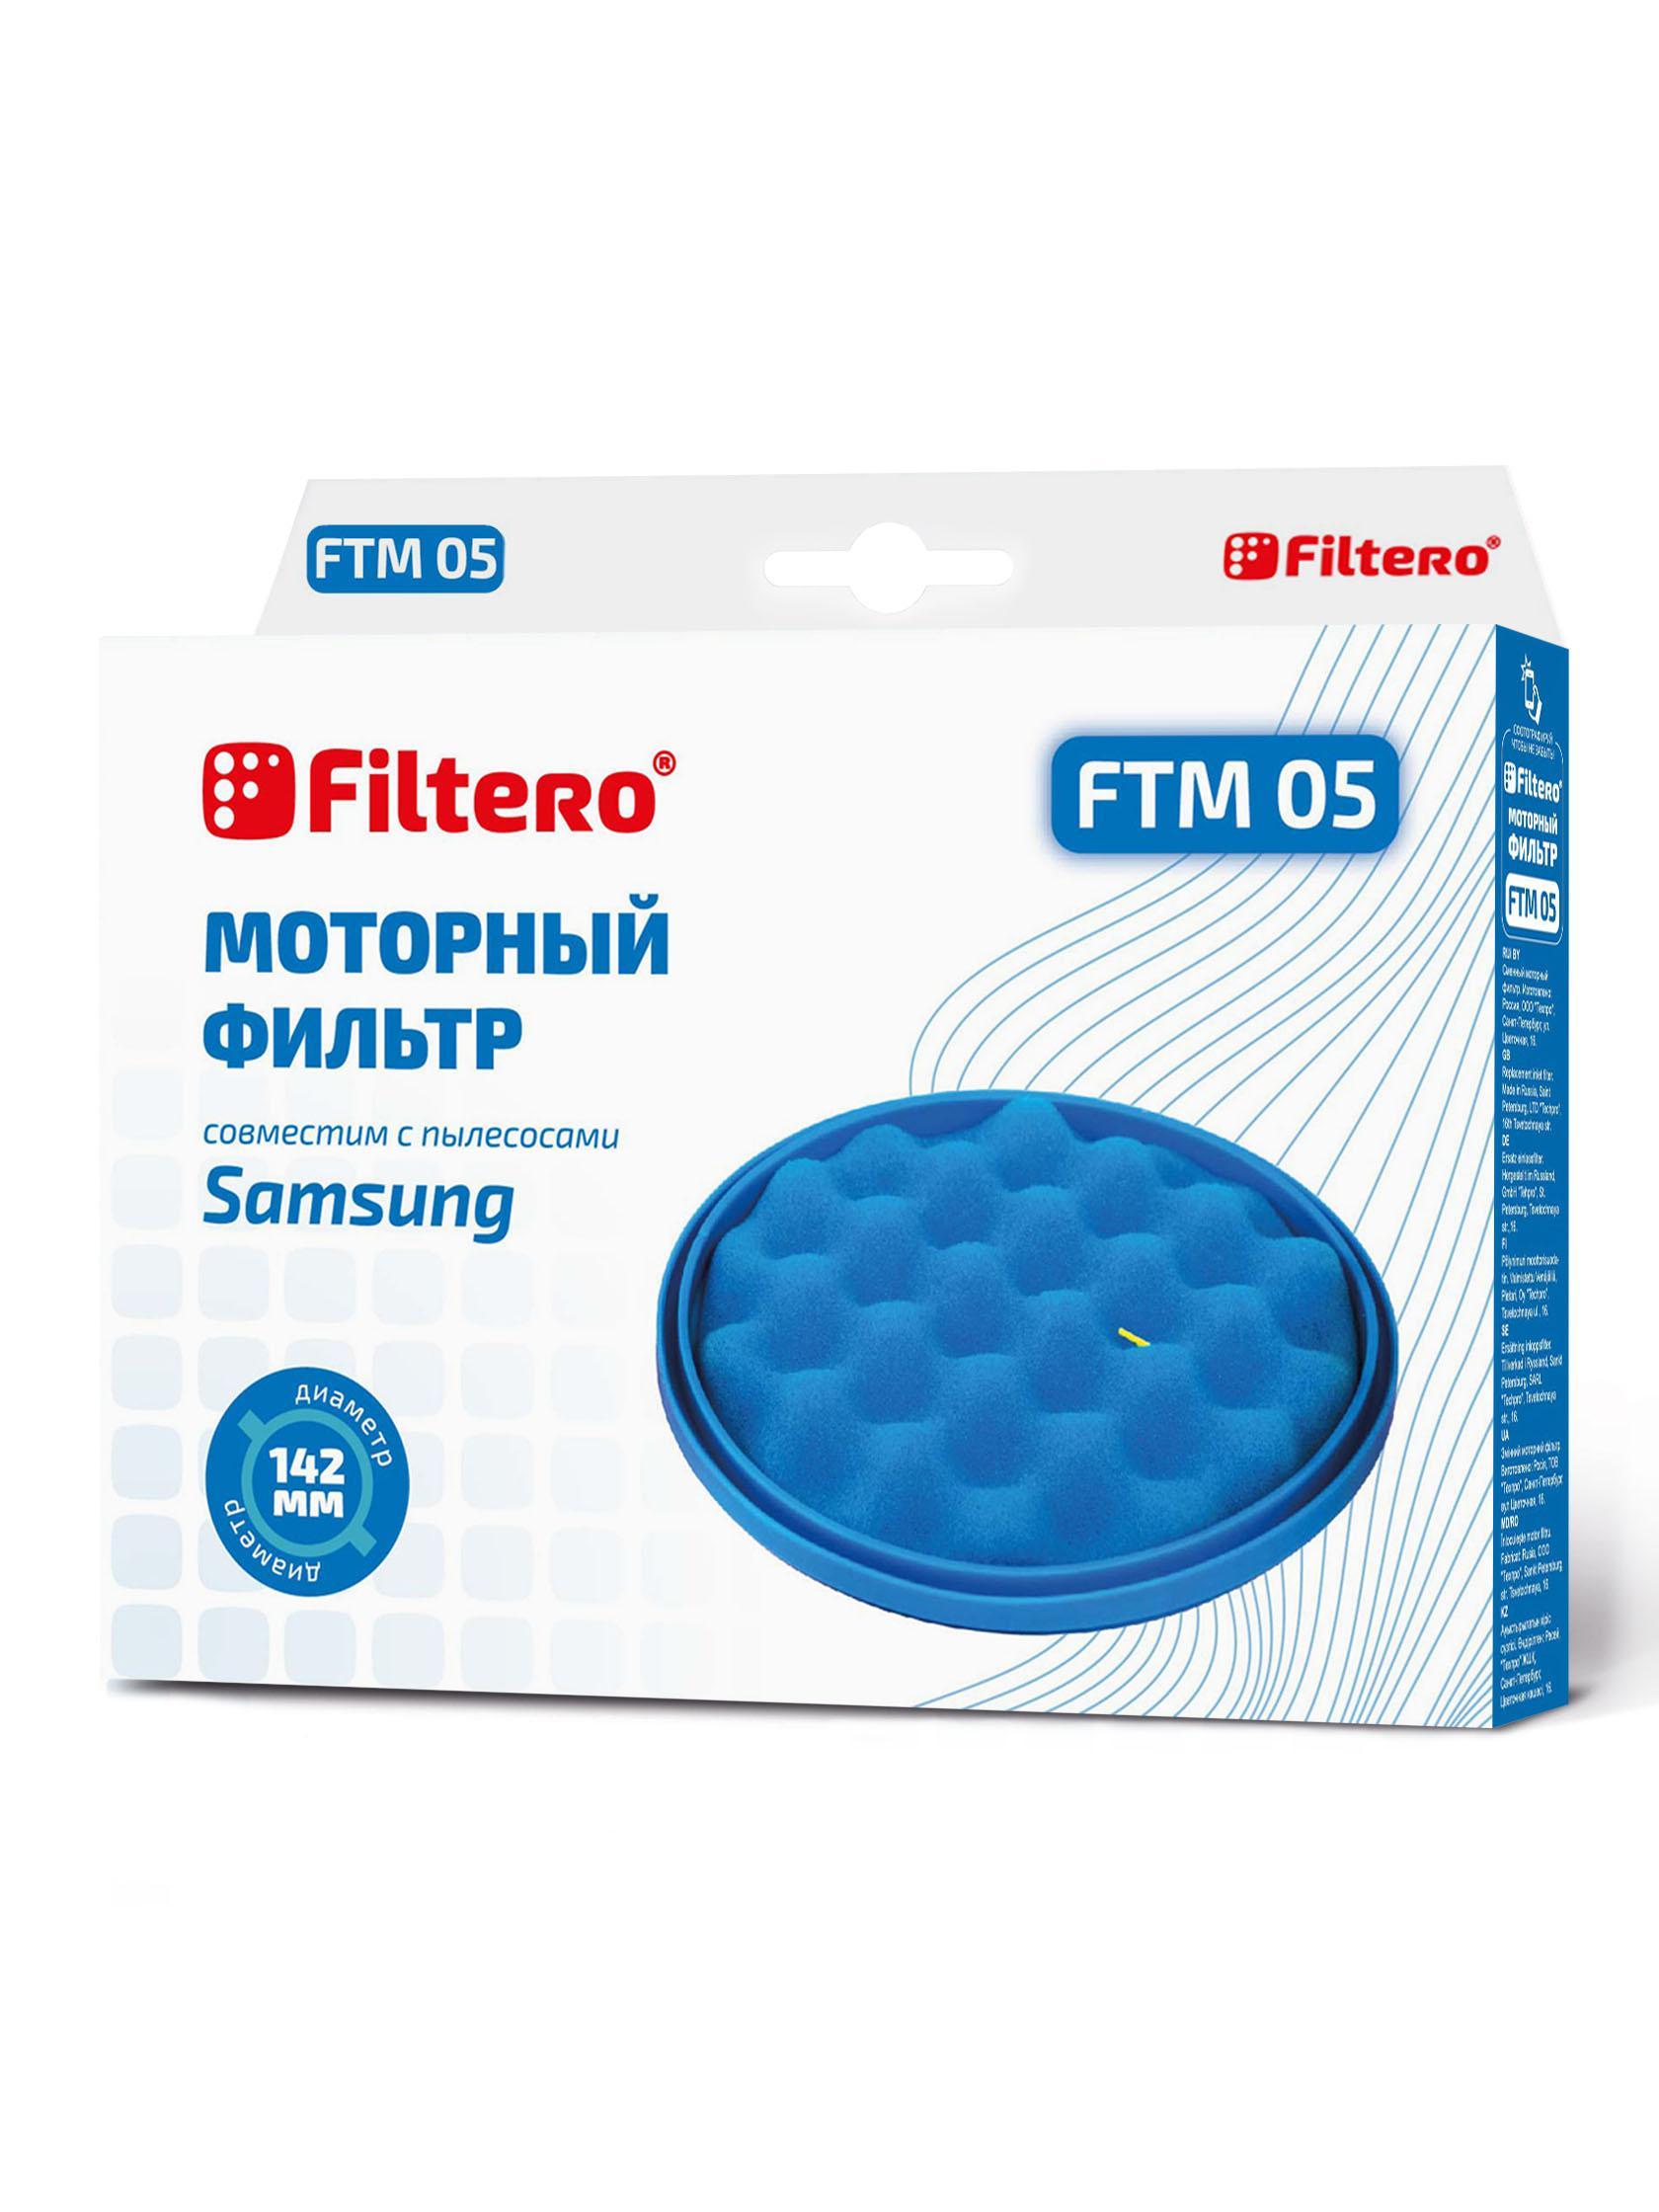 Набор Filtero Ftm 05 sam